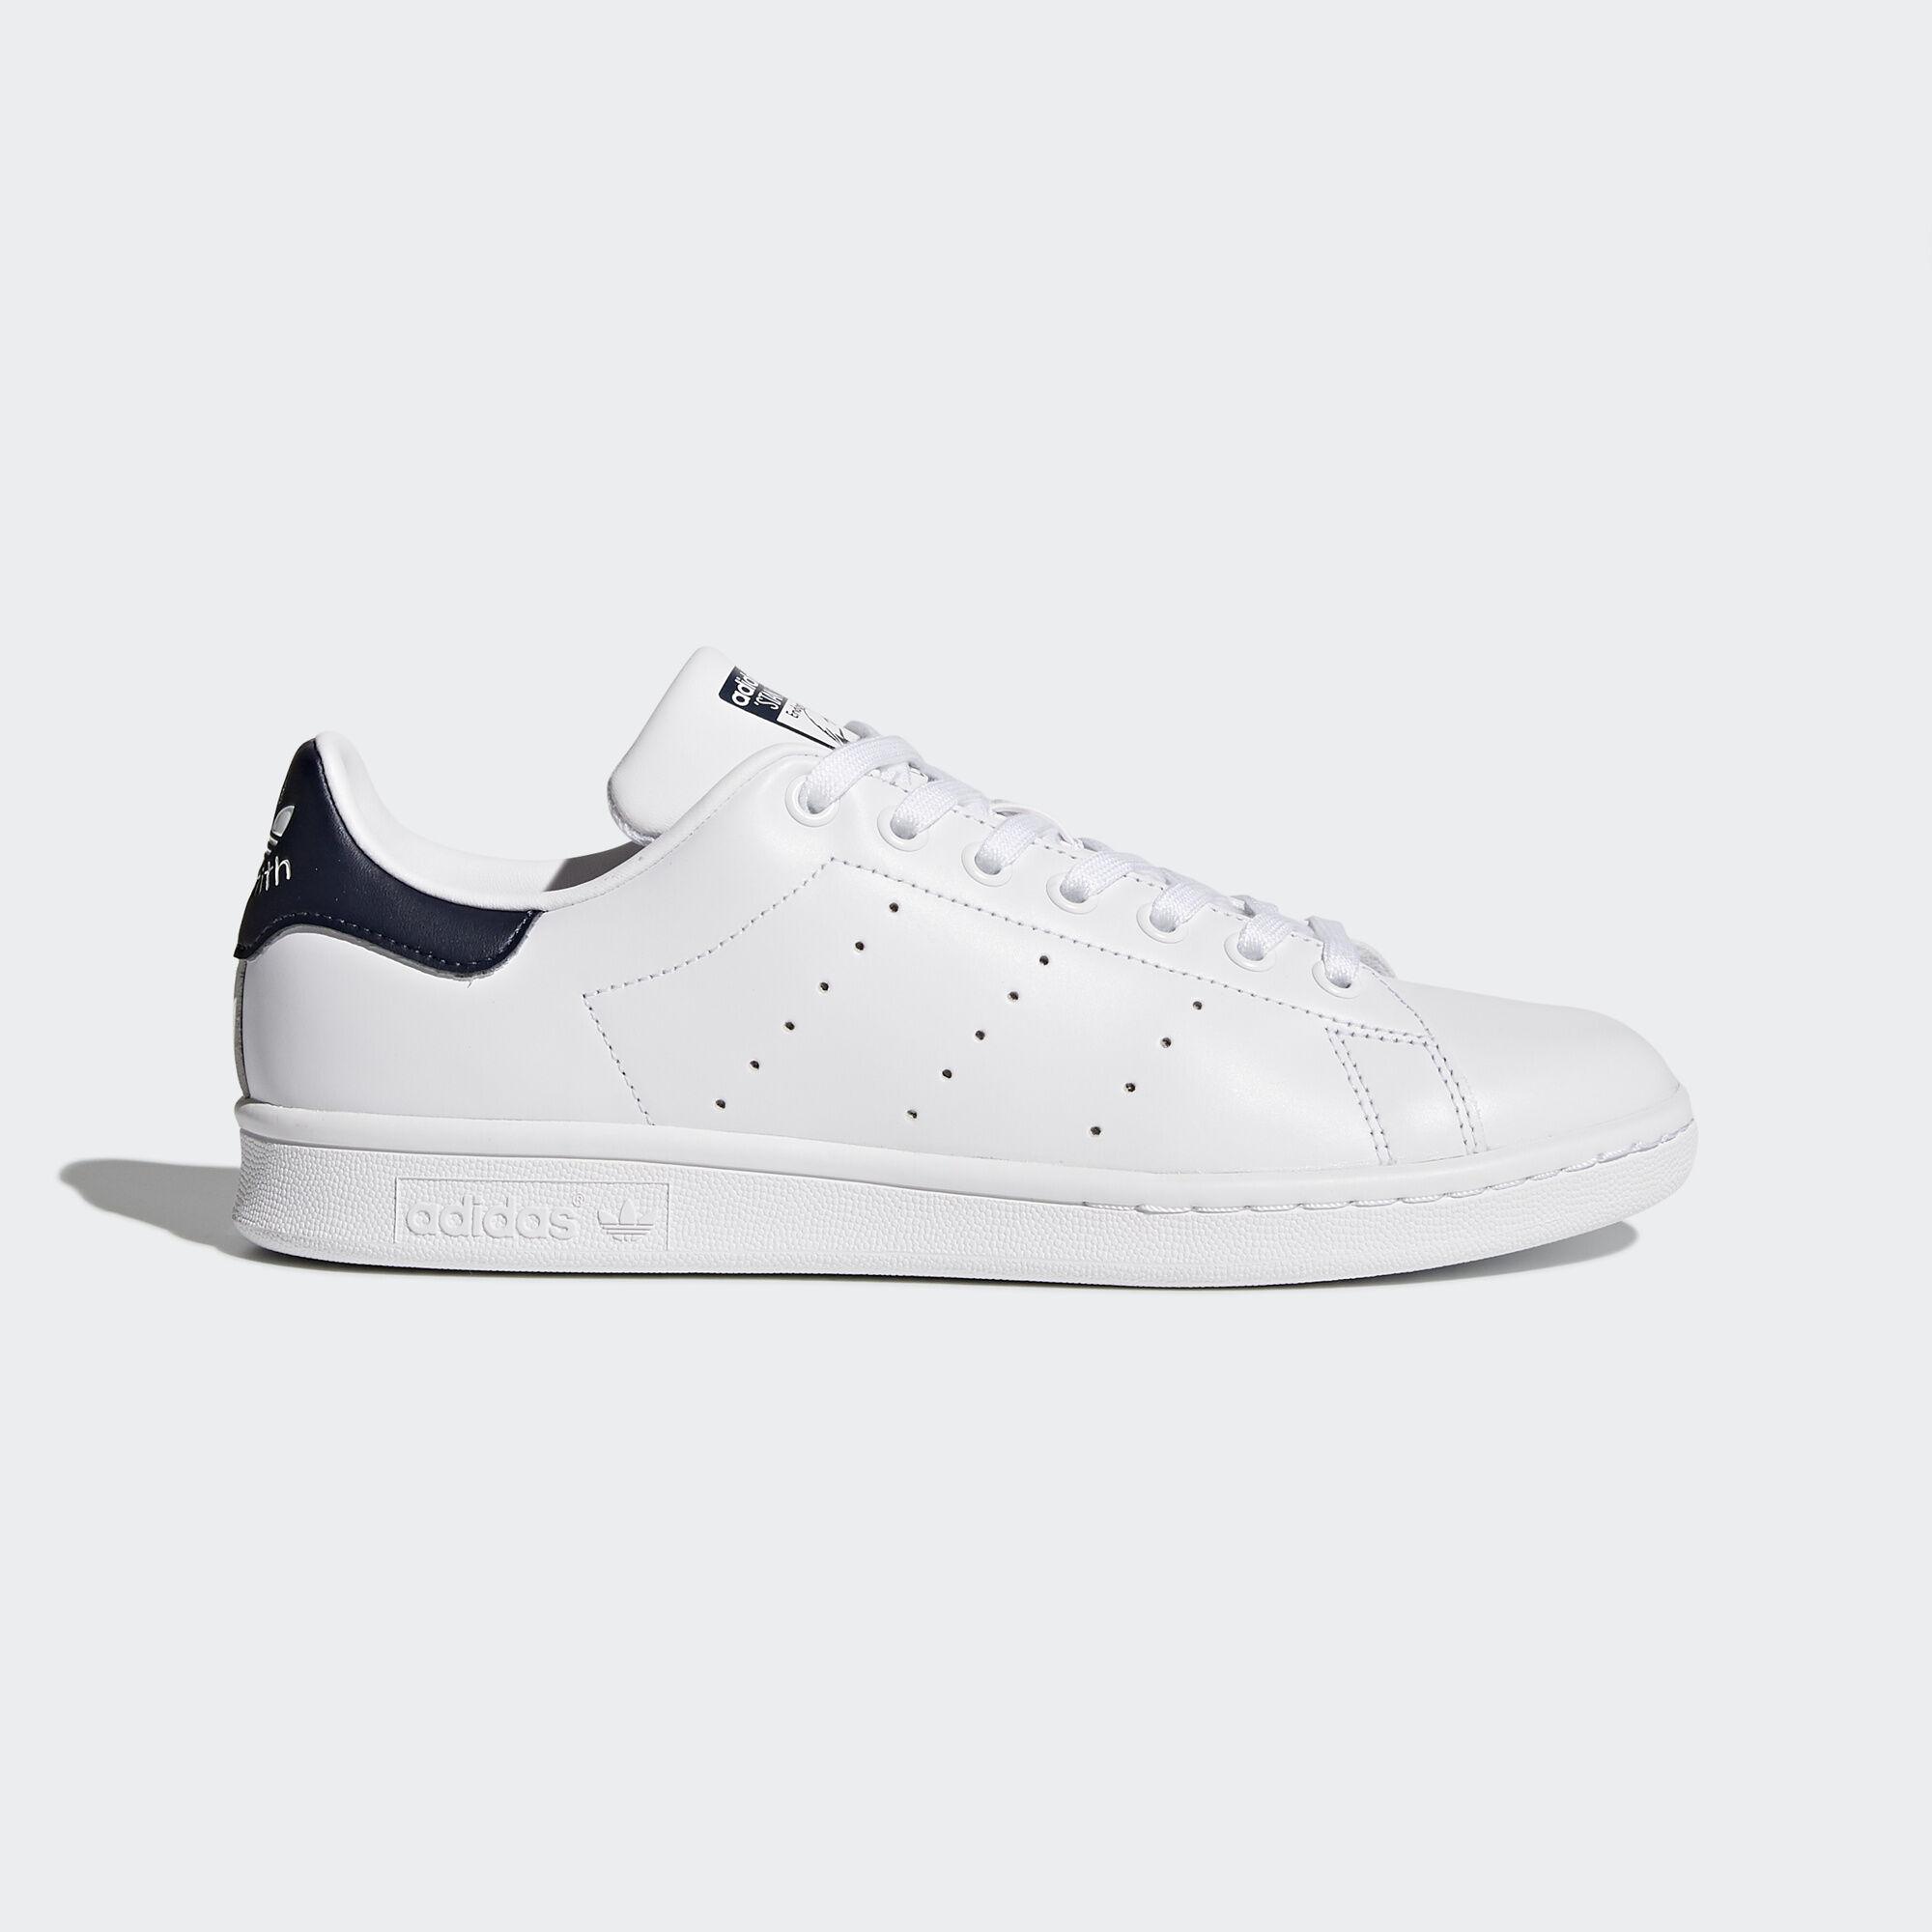 adidas - Men\u0026#39;s Stan Smith Shoes Core White/Dark Blue M20325